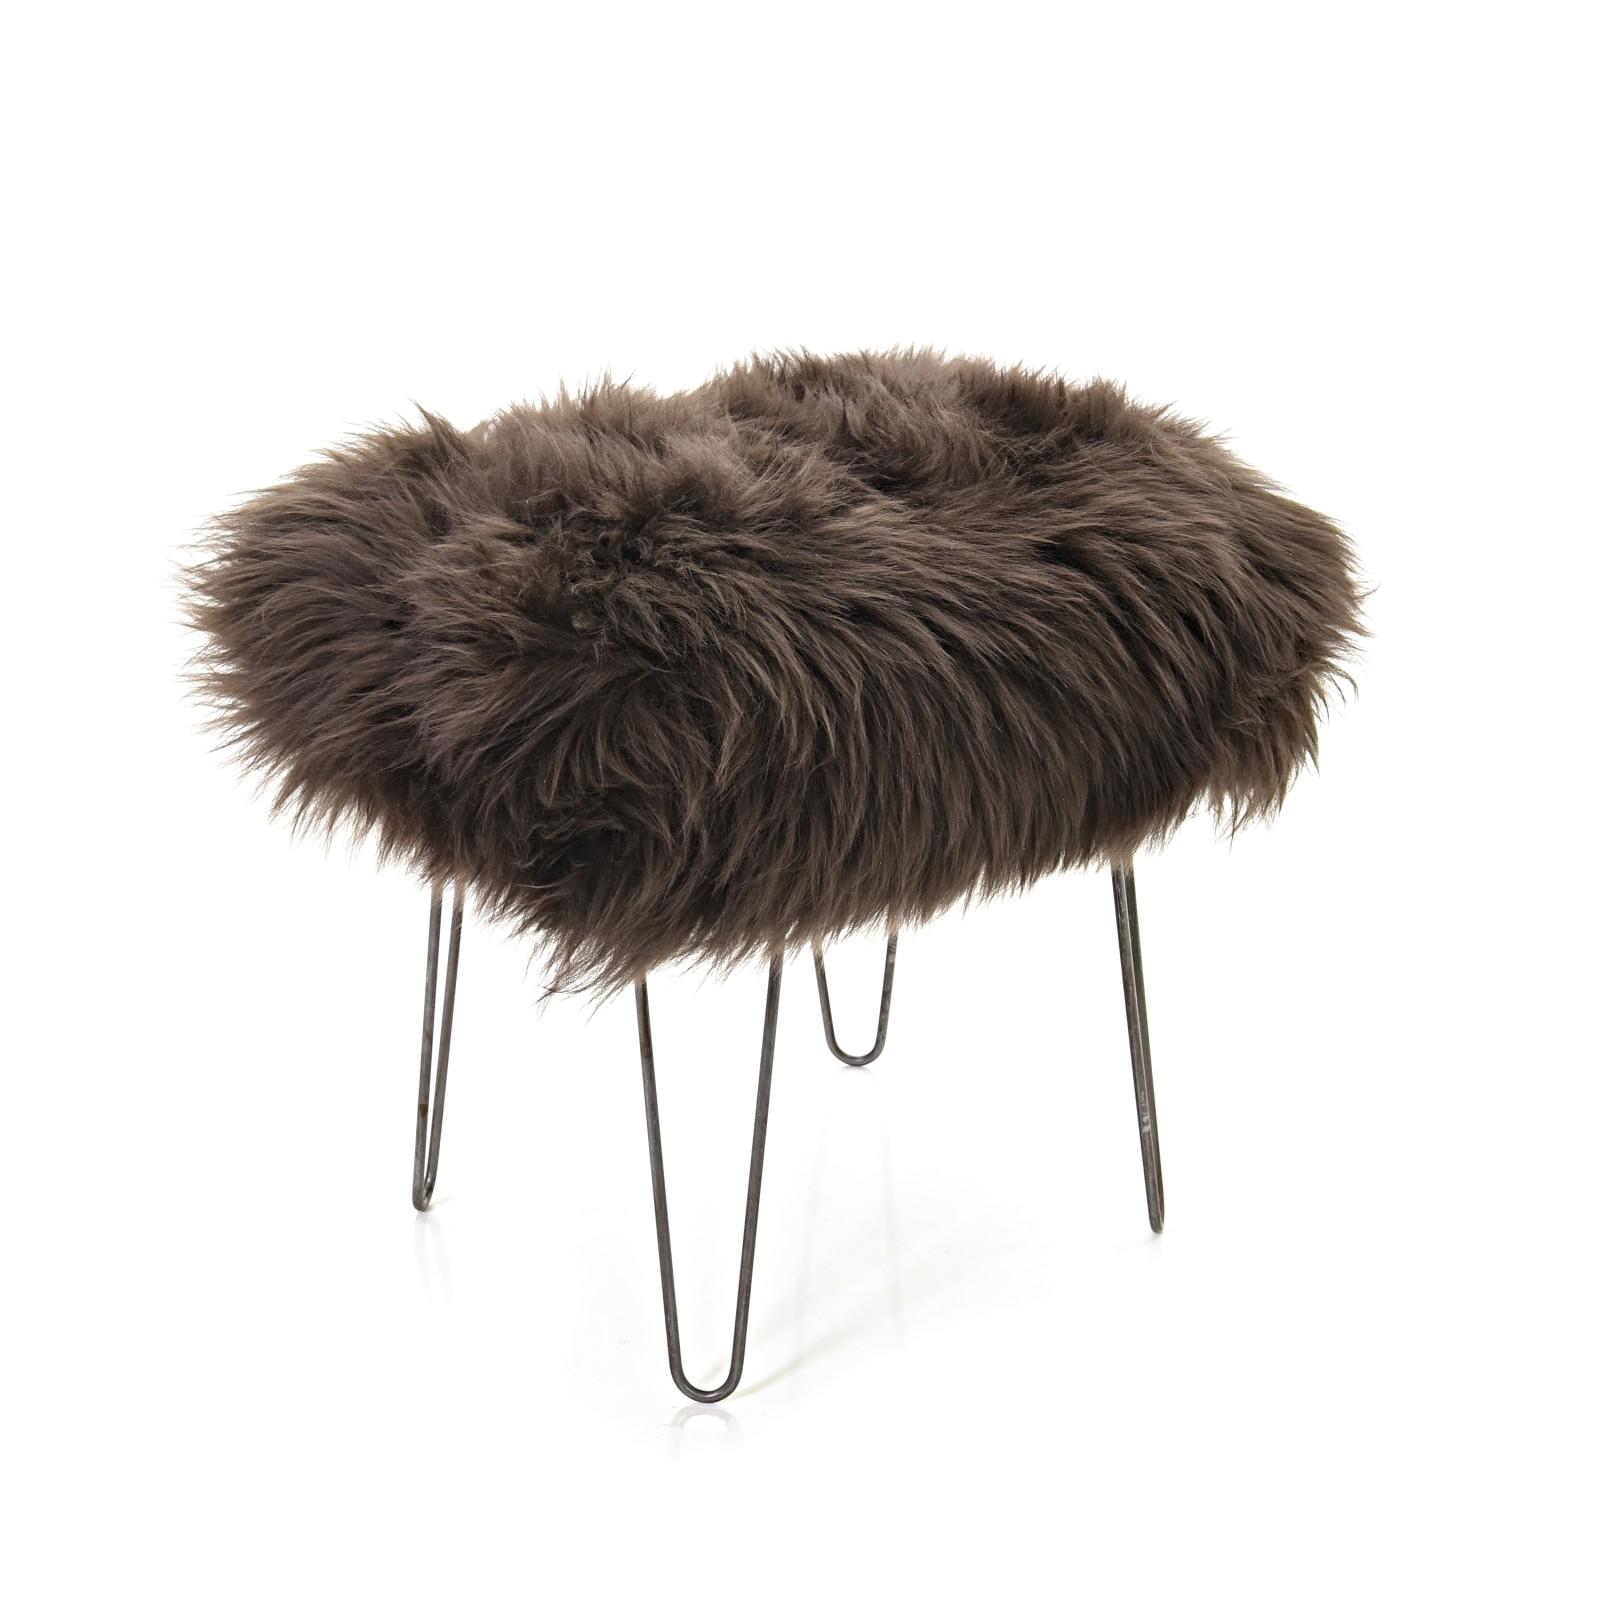 Ffion - Sheepskin Footstool Mink